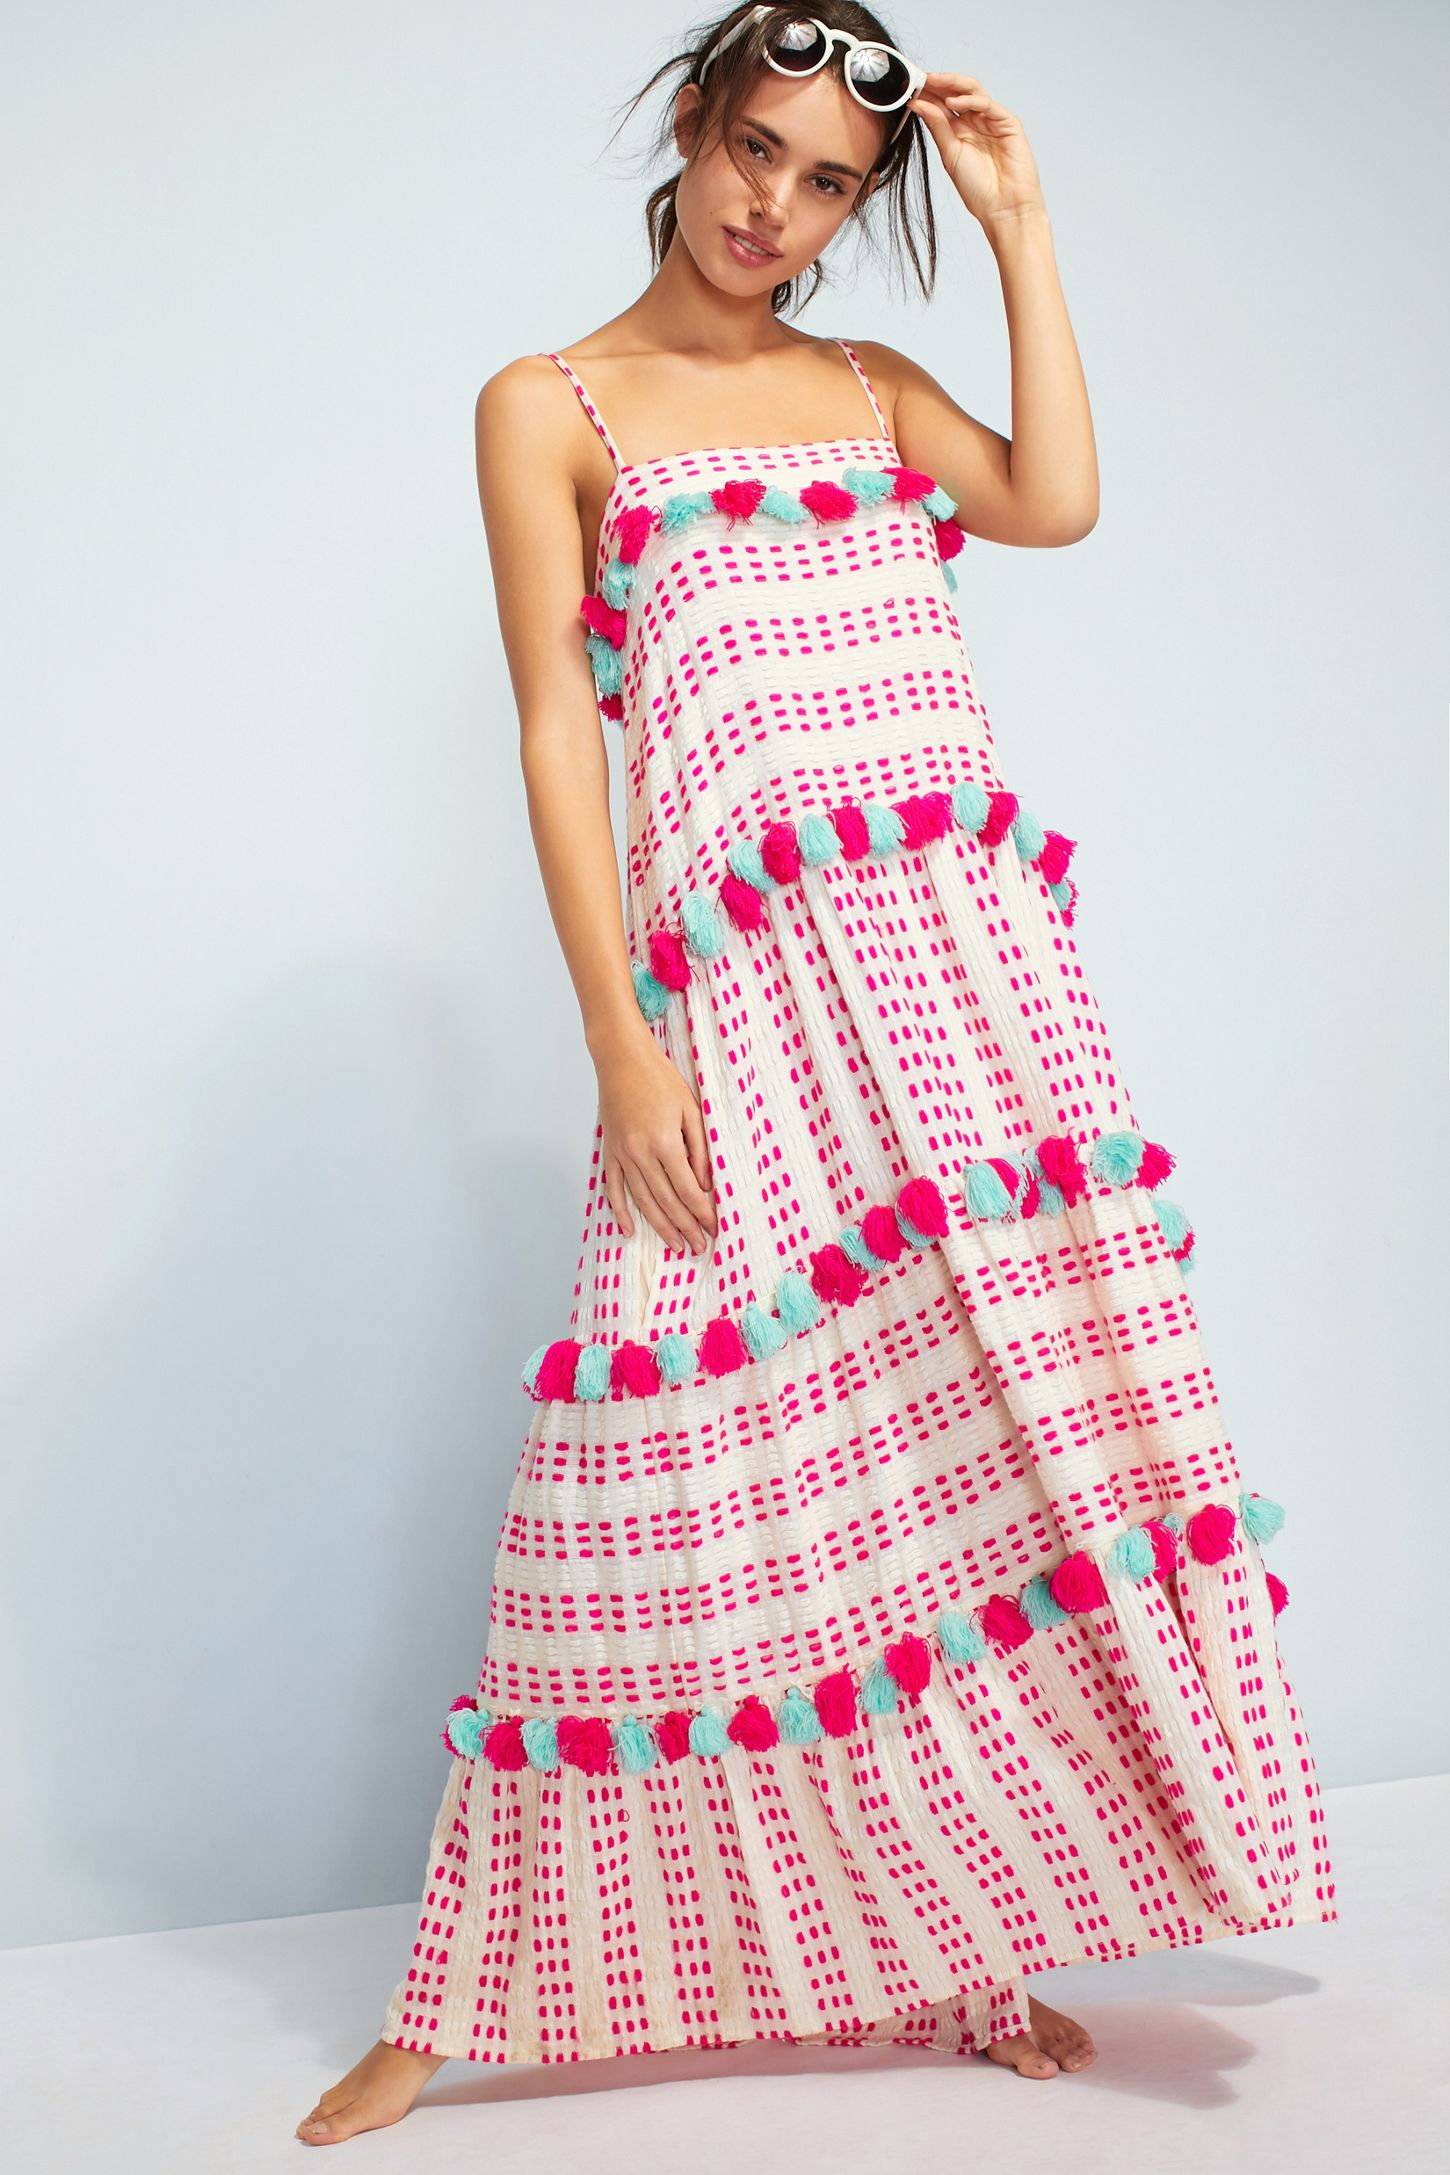 d34a04eaef Lola Pommed Dress